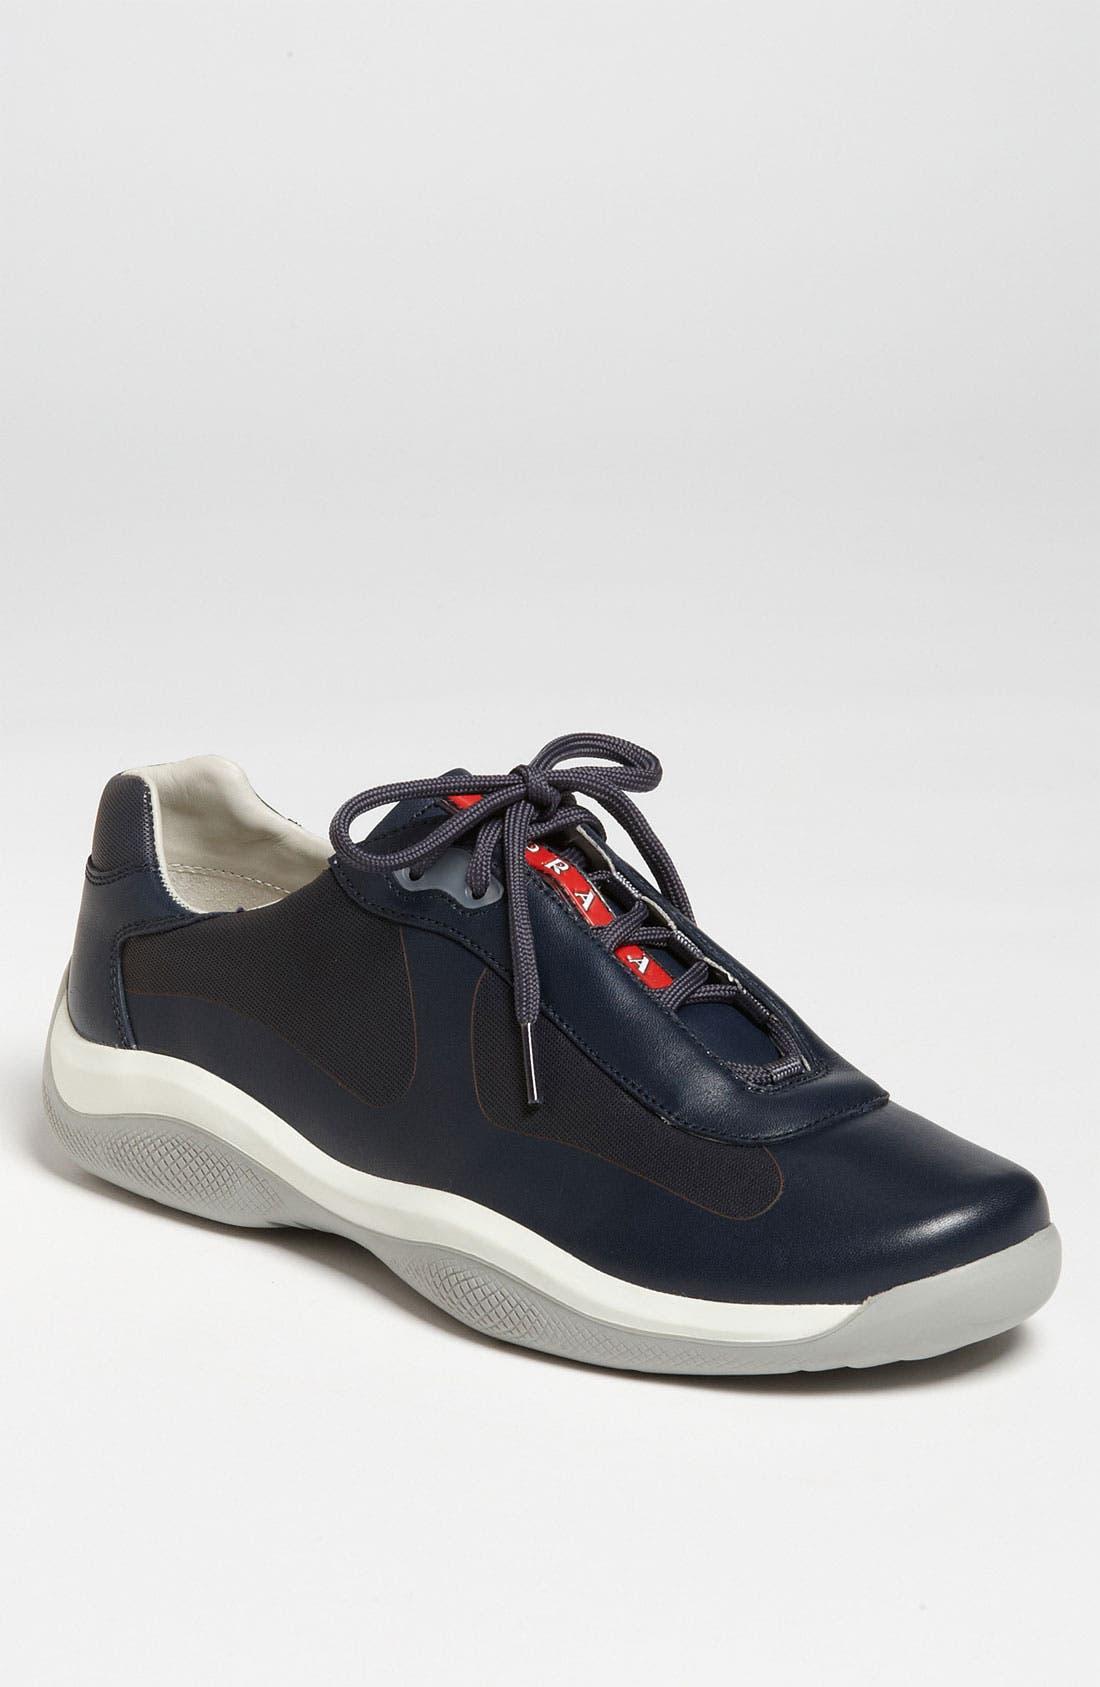 Alternate Image 1 Selected - Prada Leather Sneaker